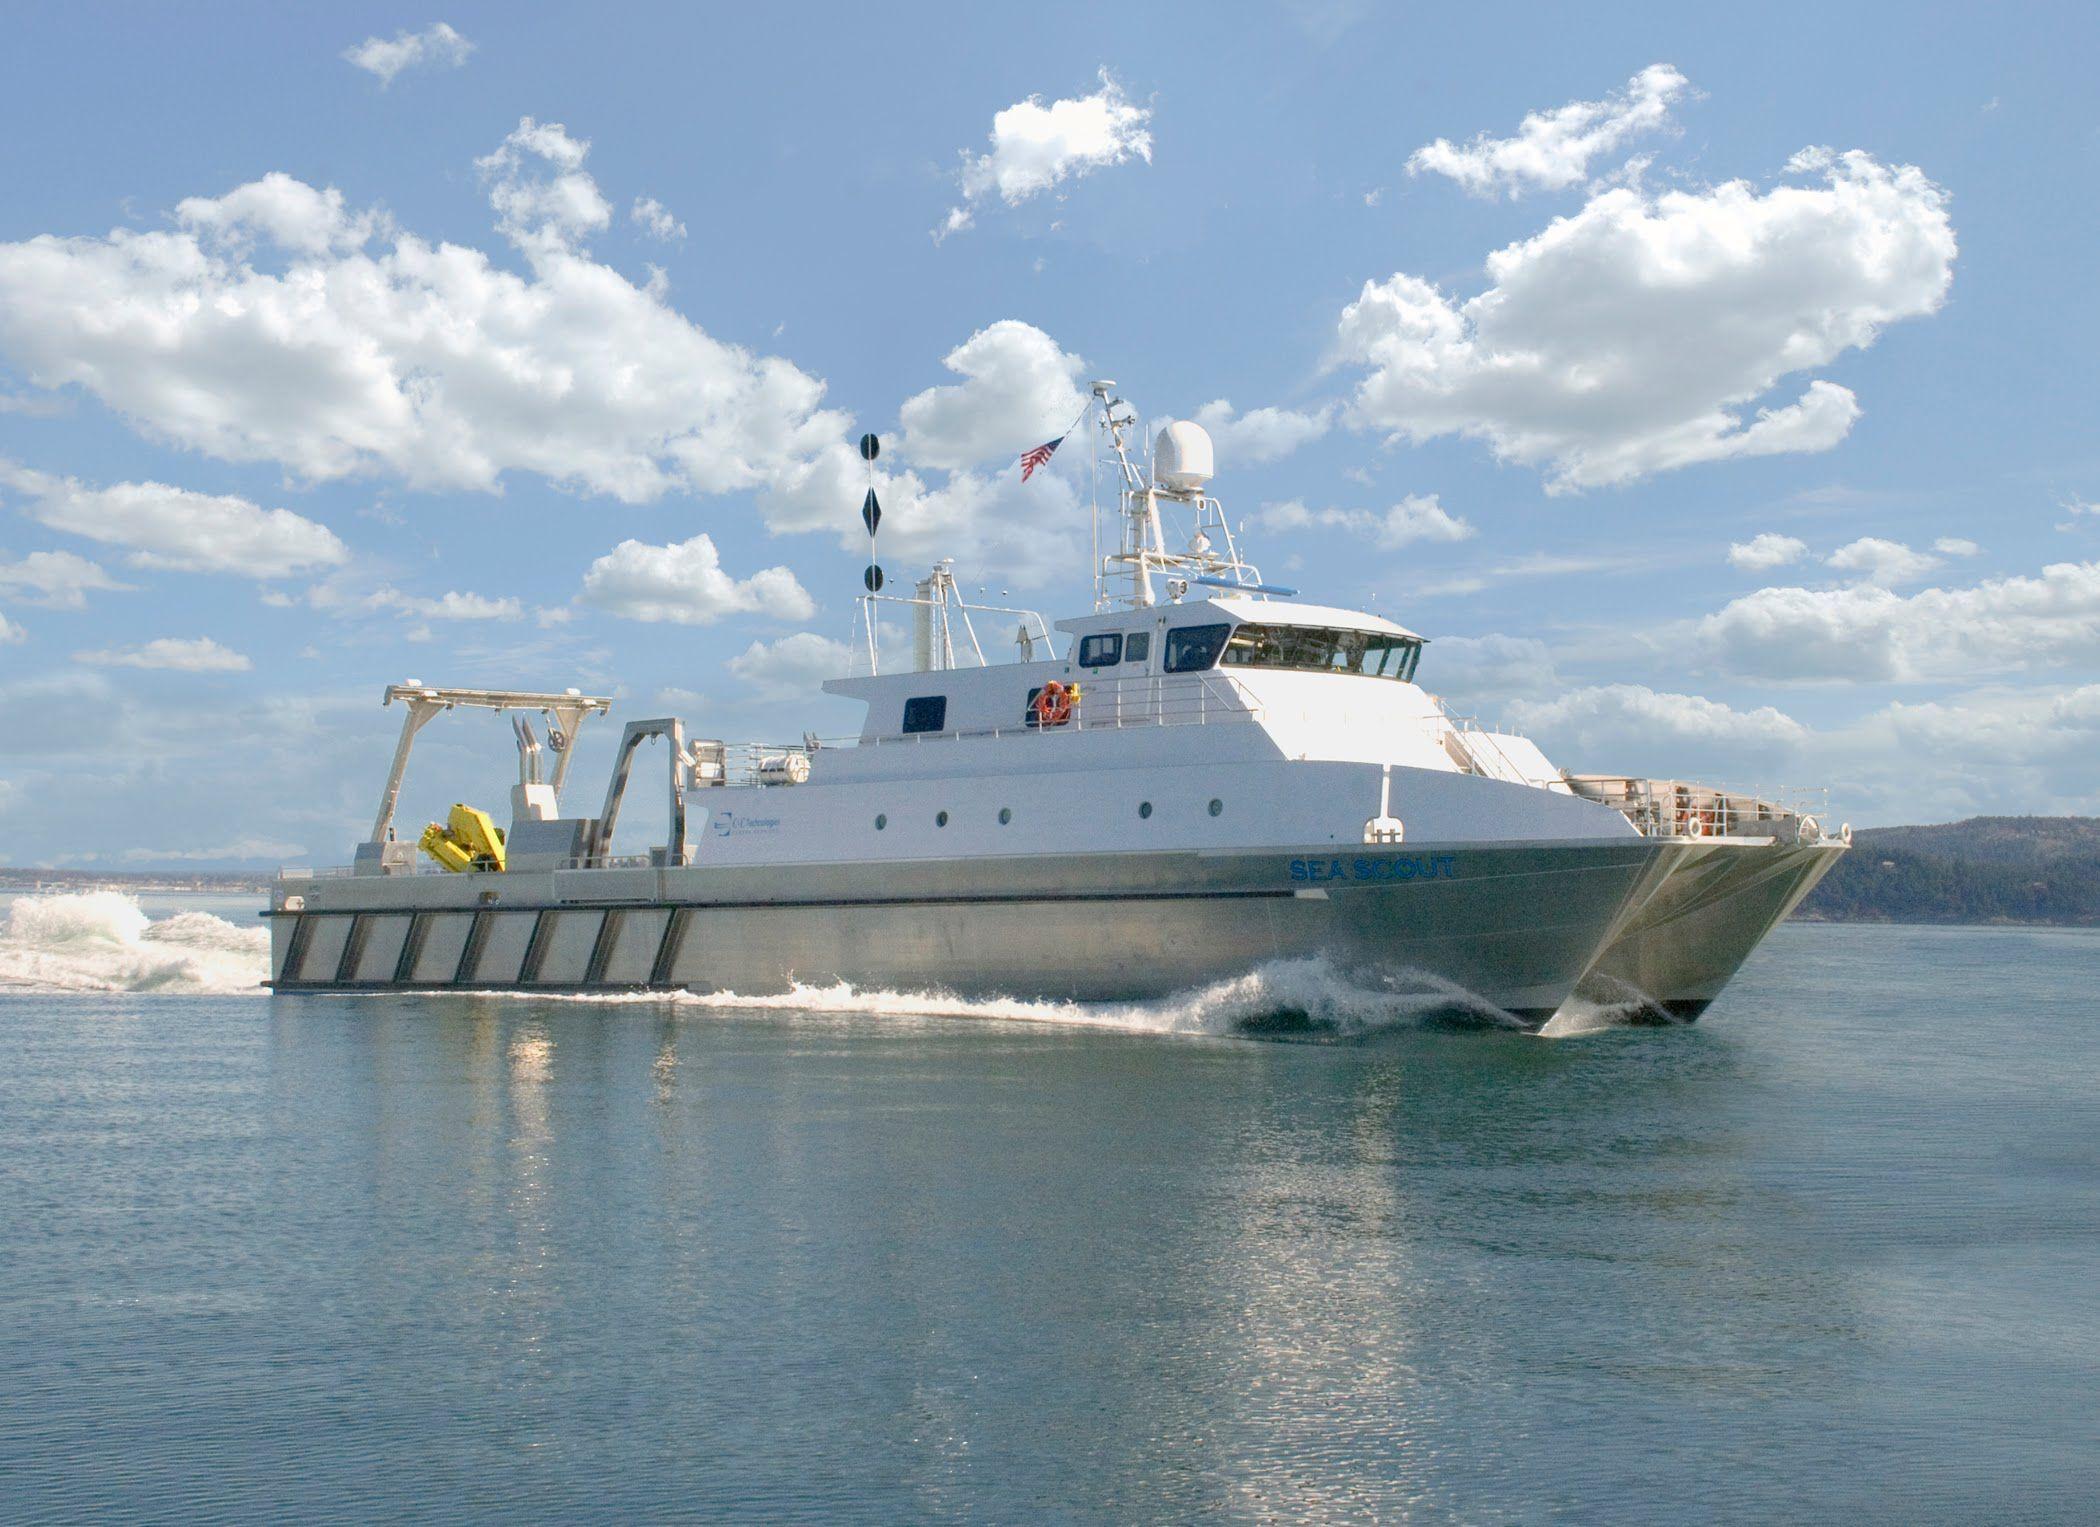 Aluminum Catamaran Work Boat Survey Vessel